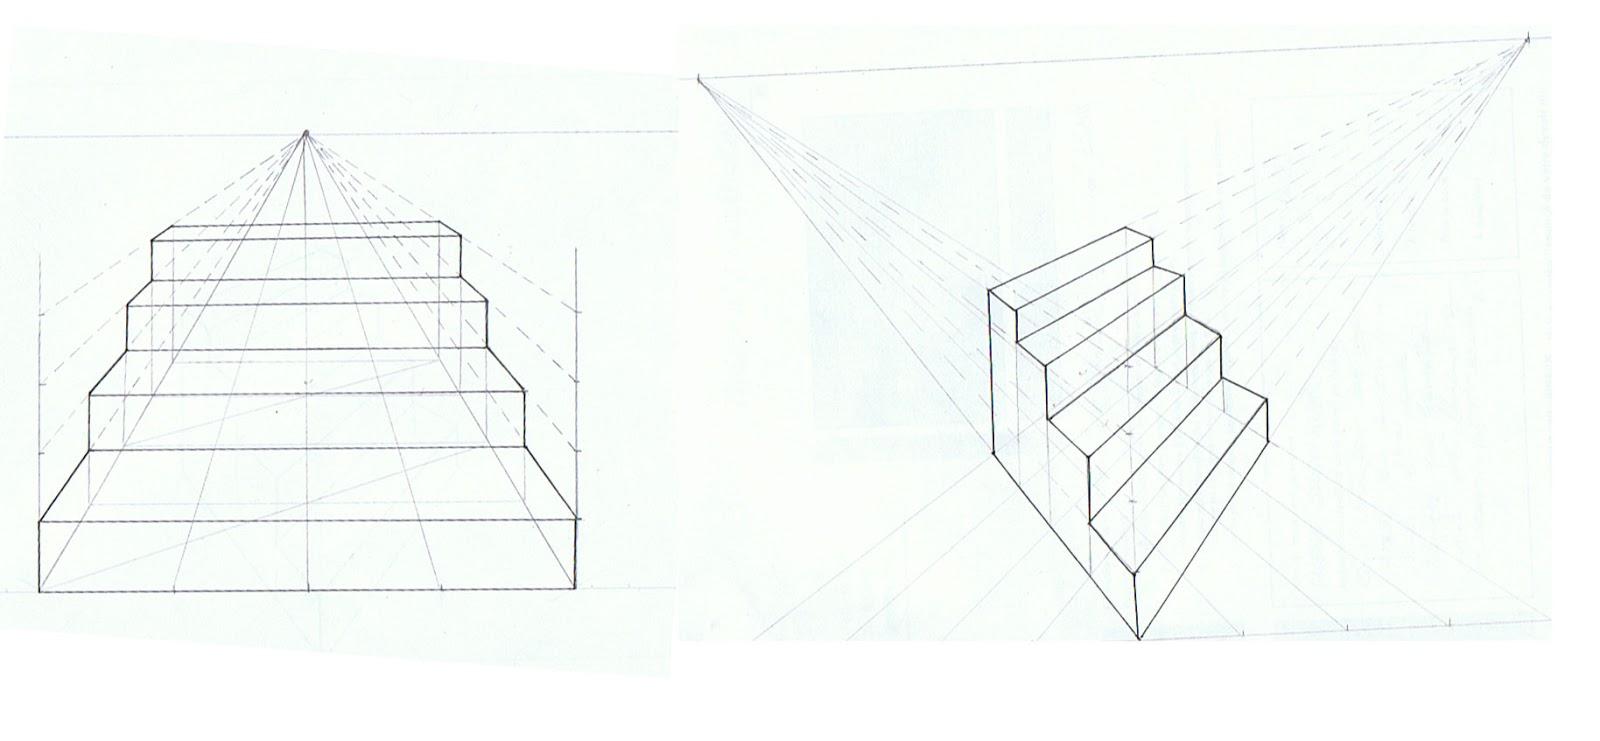 comment dessiner des marches d escalier. Black Bedroom Furniture Sets. Home Design Ideas